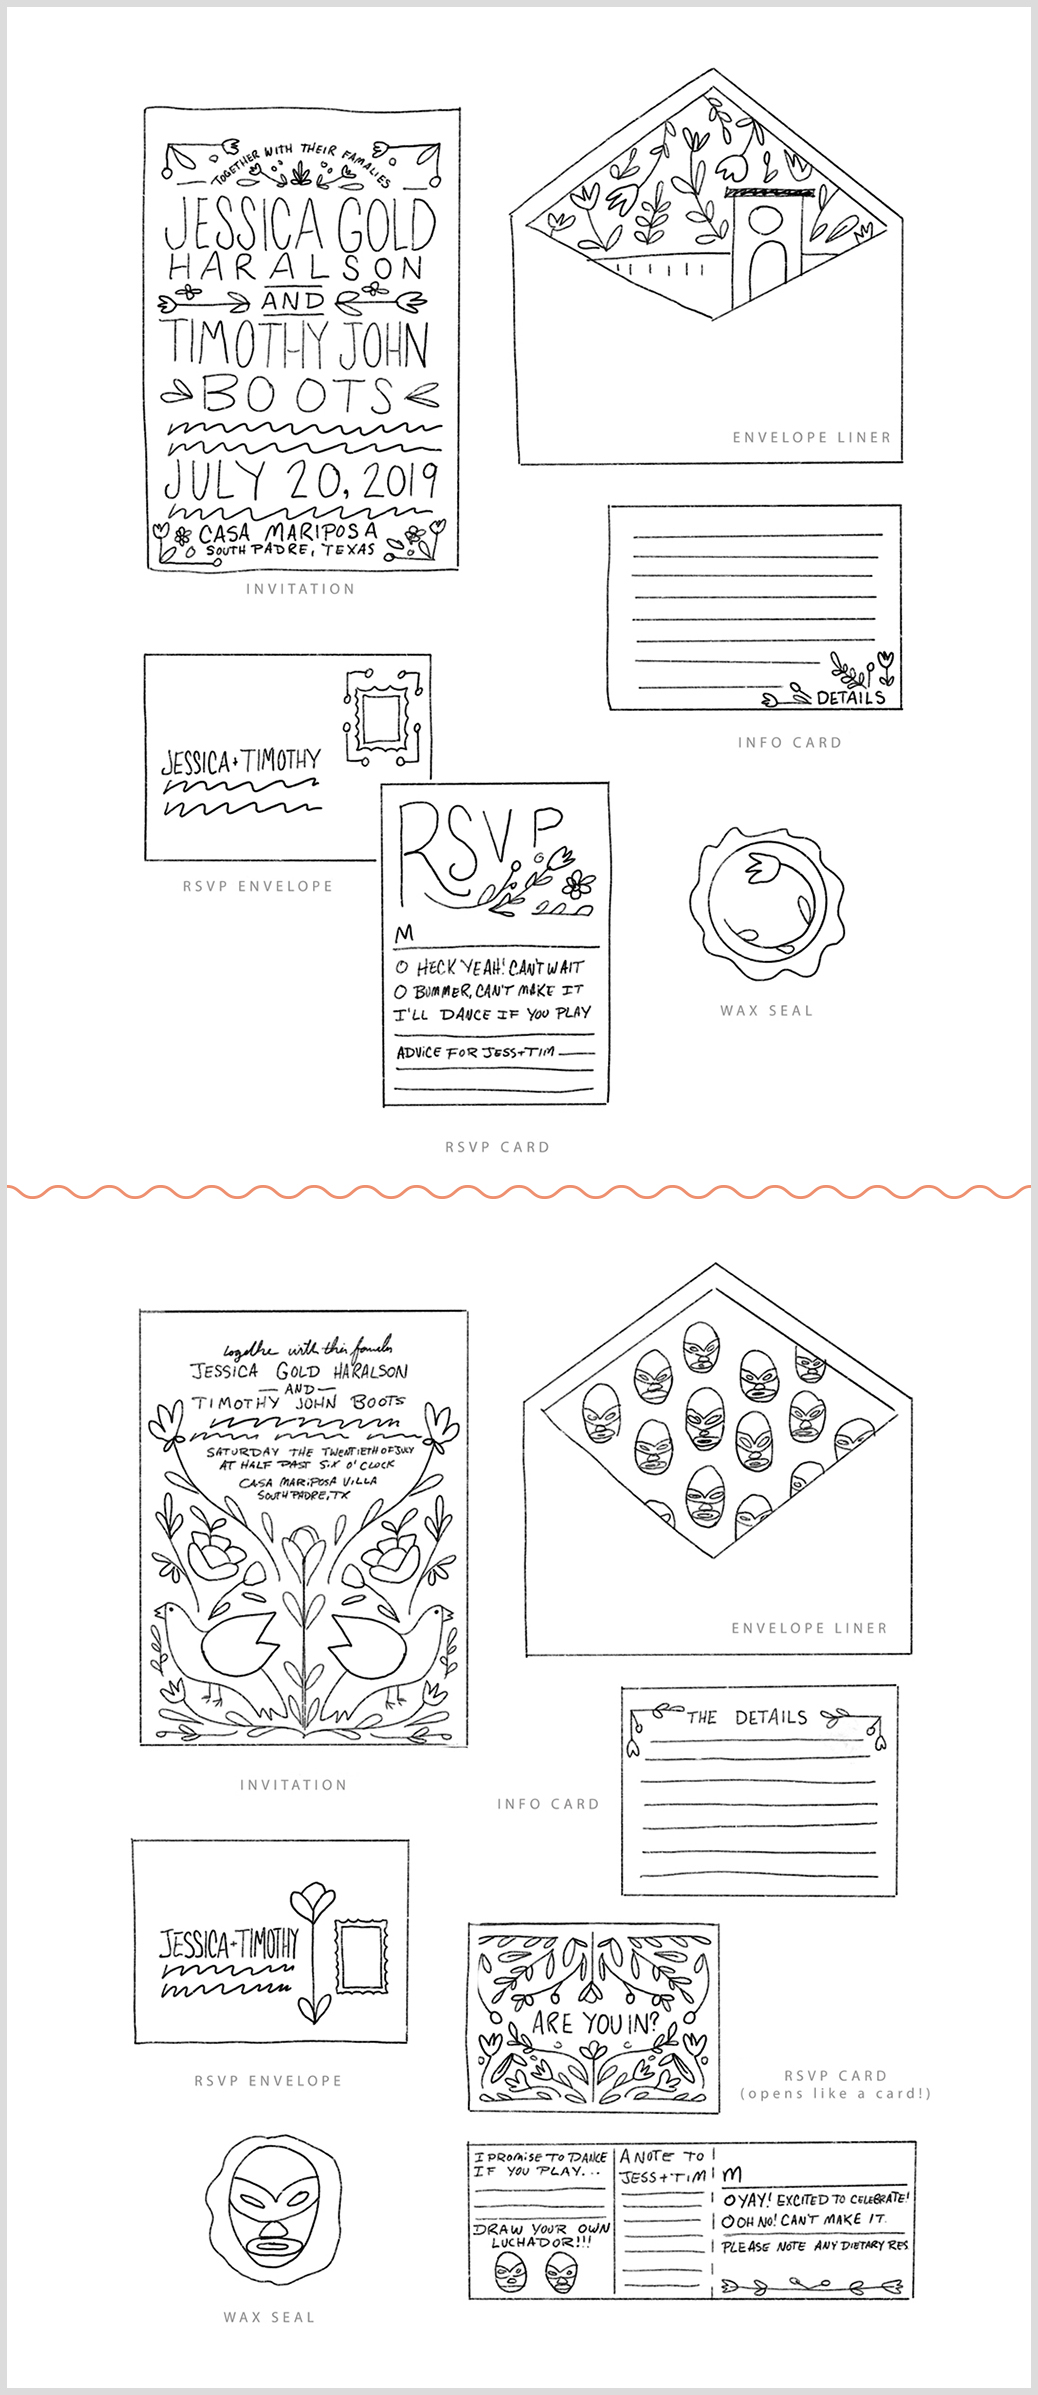 Design sketches for the custom wedding invitation designs, from a custom stationery designer and illustrator